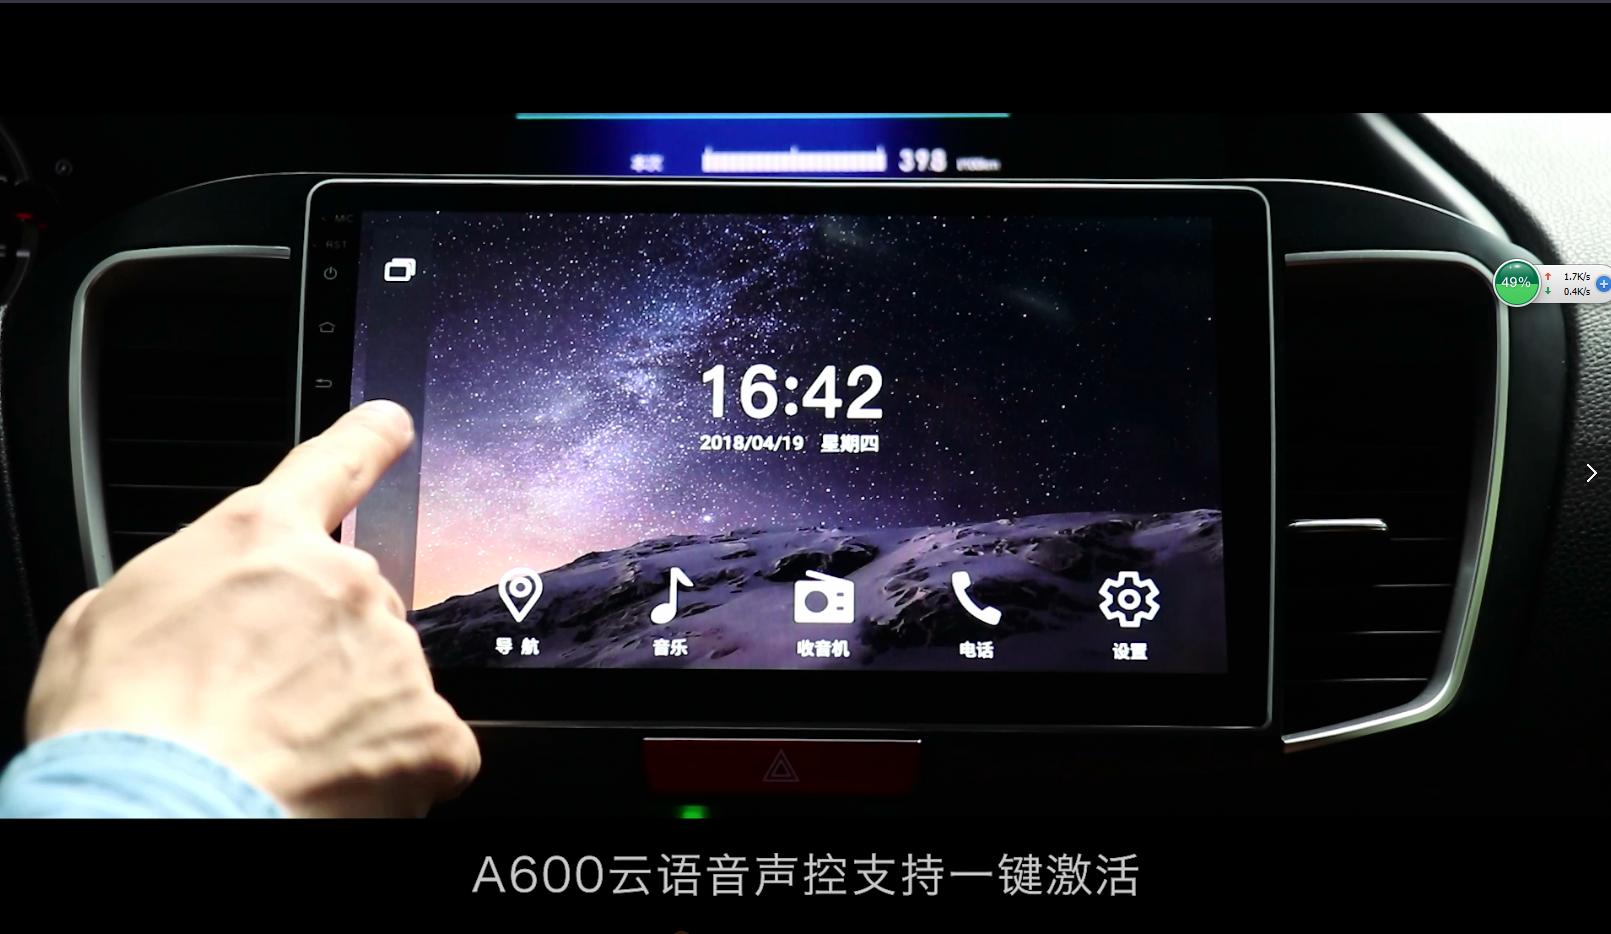 A600系列智能网络版车机介绍